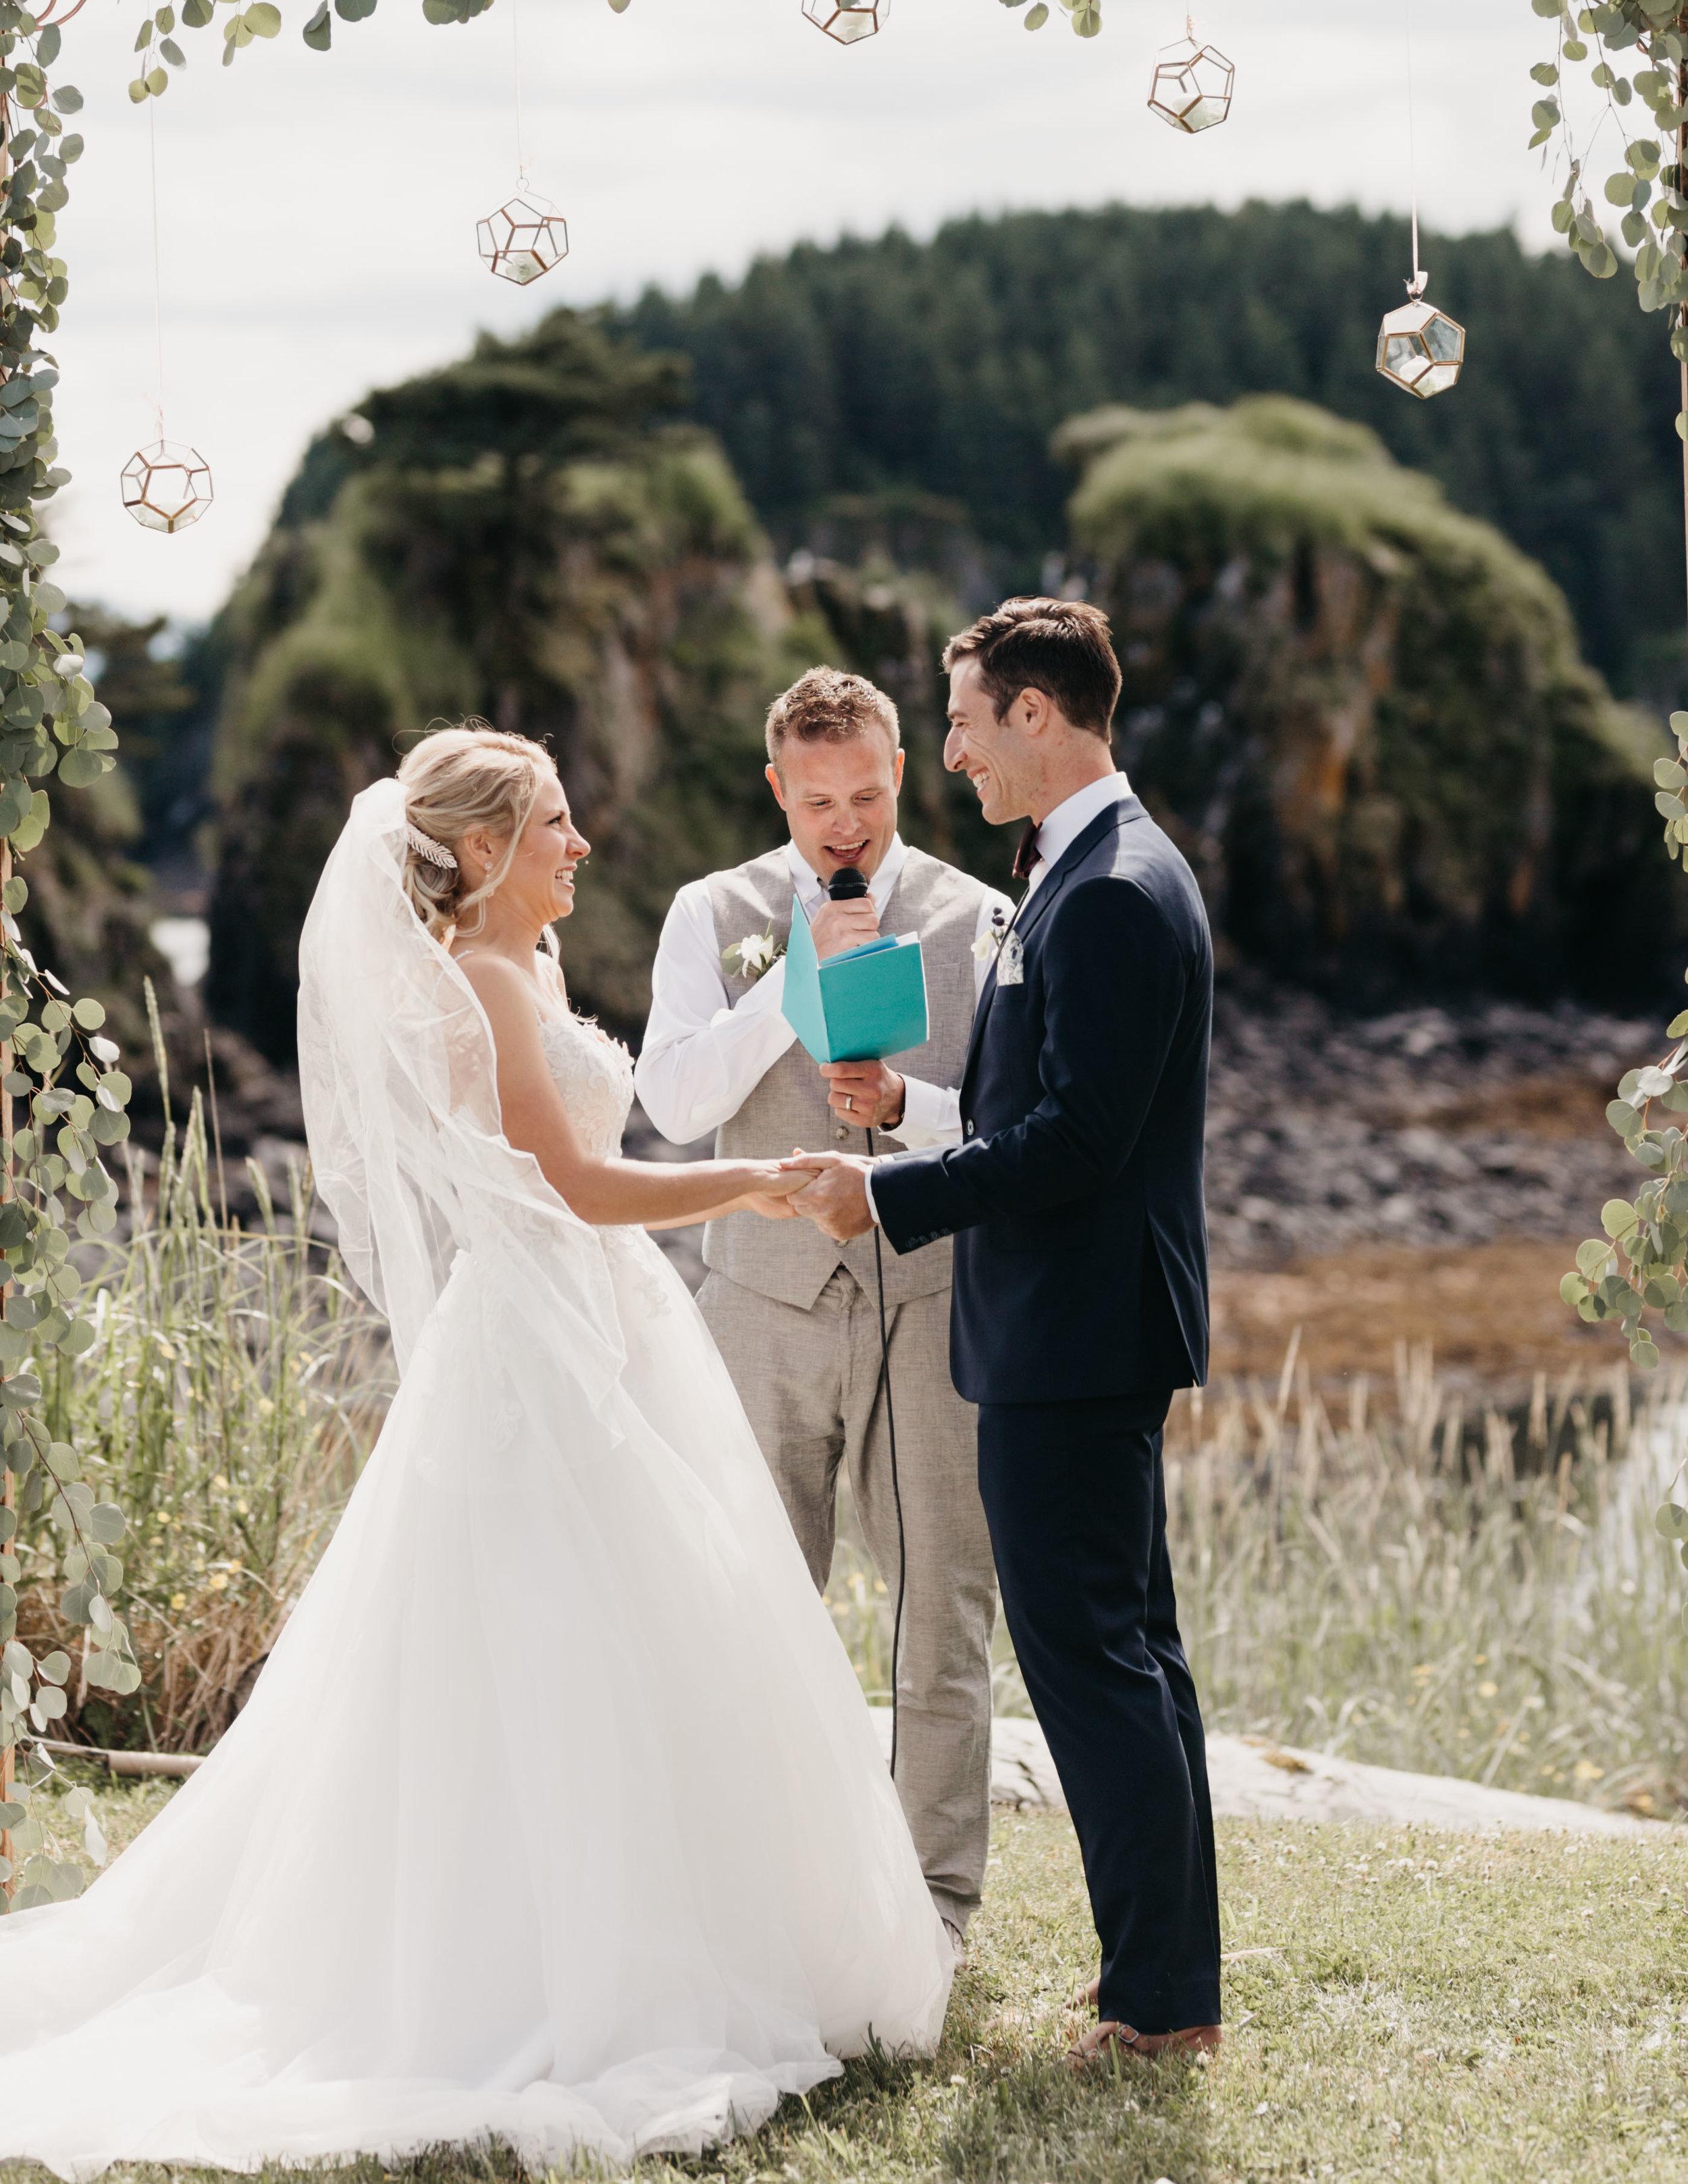 Utah-Wedding-Photographer-61.jpg